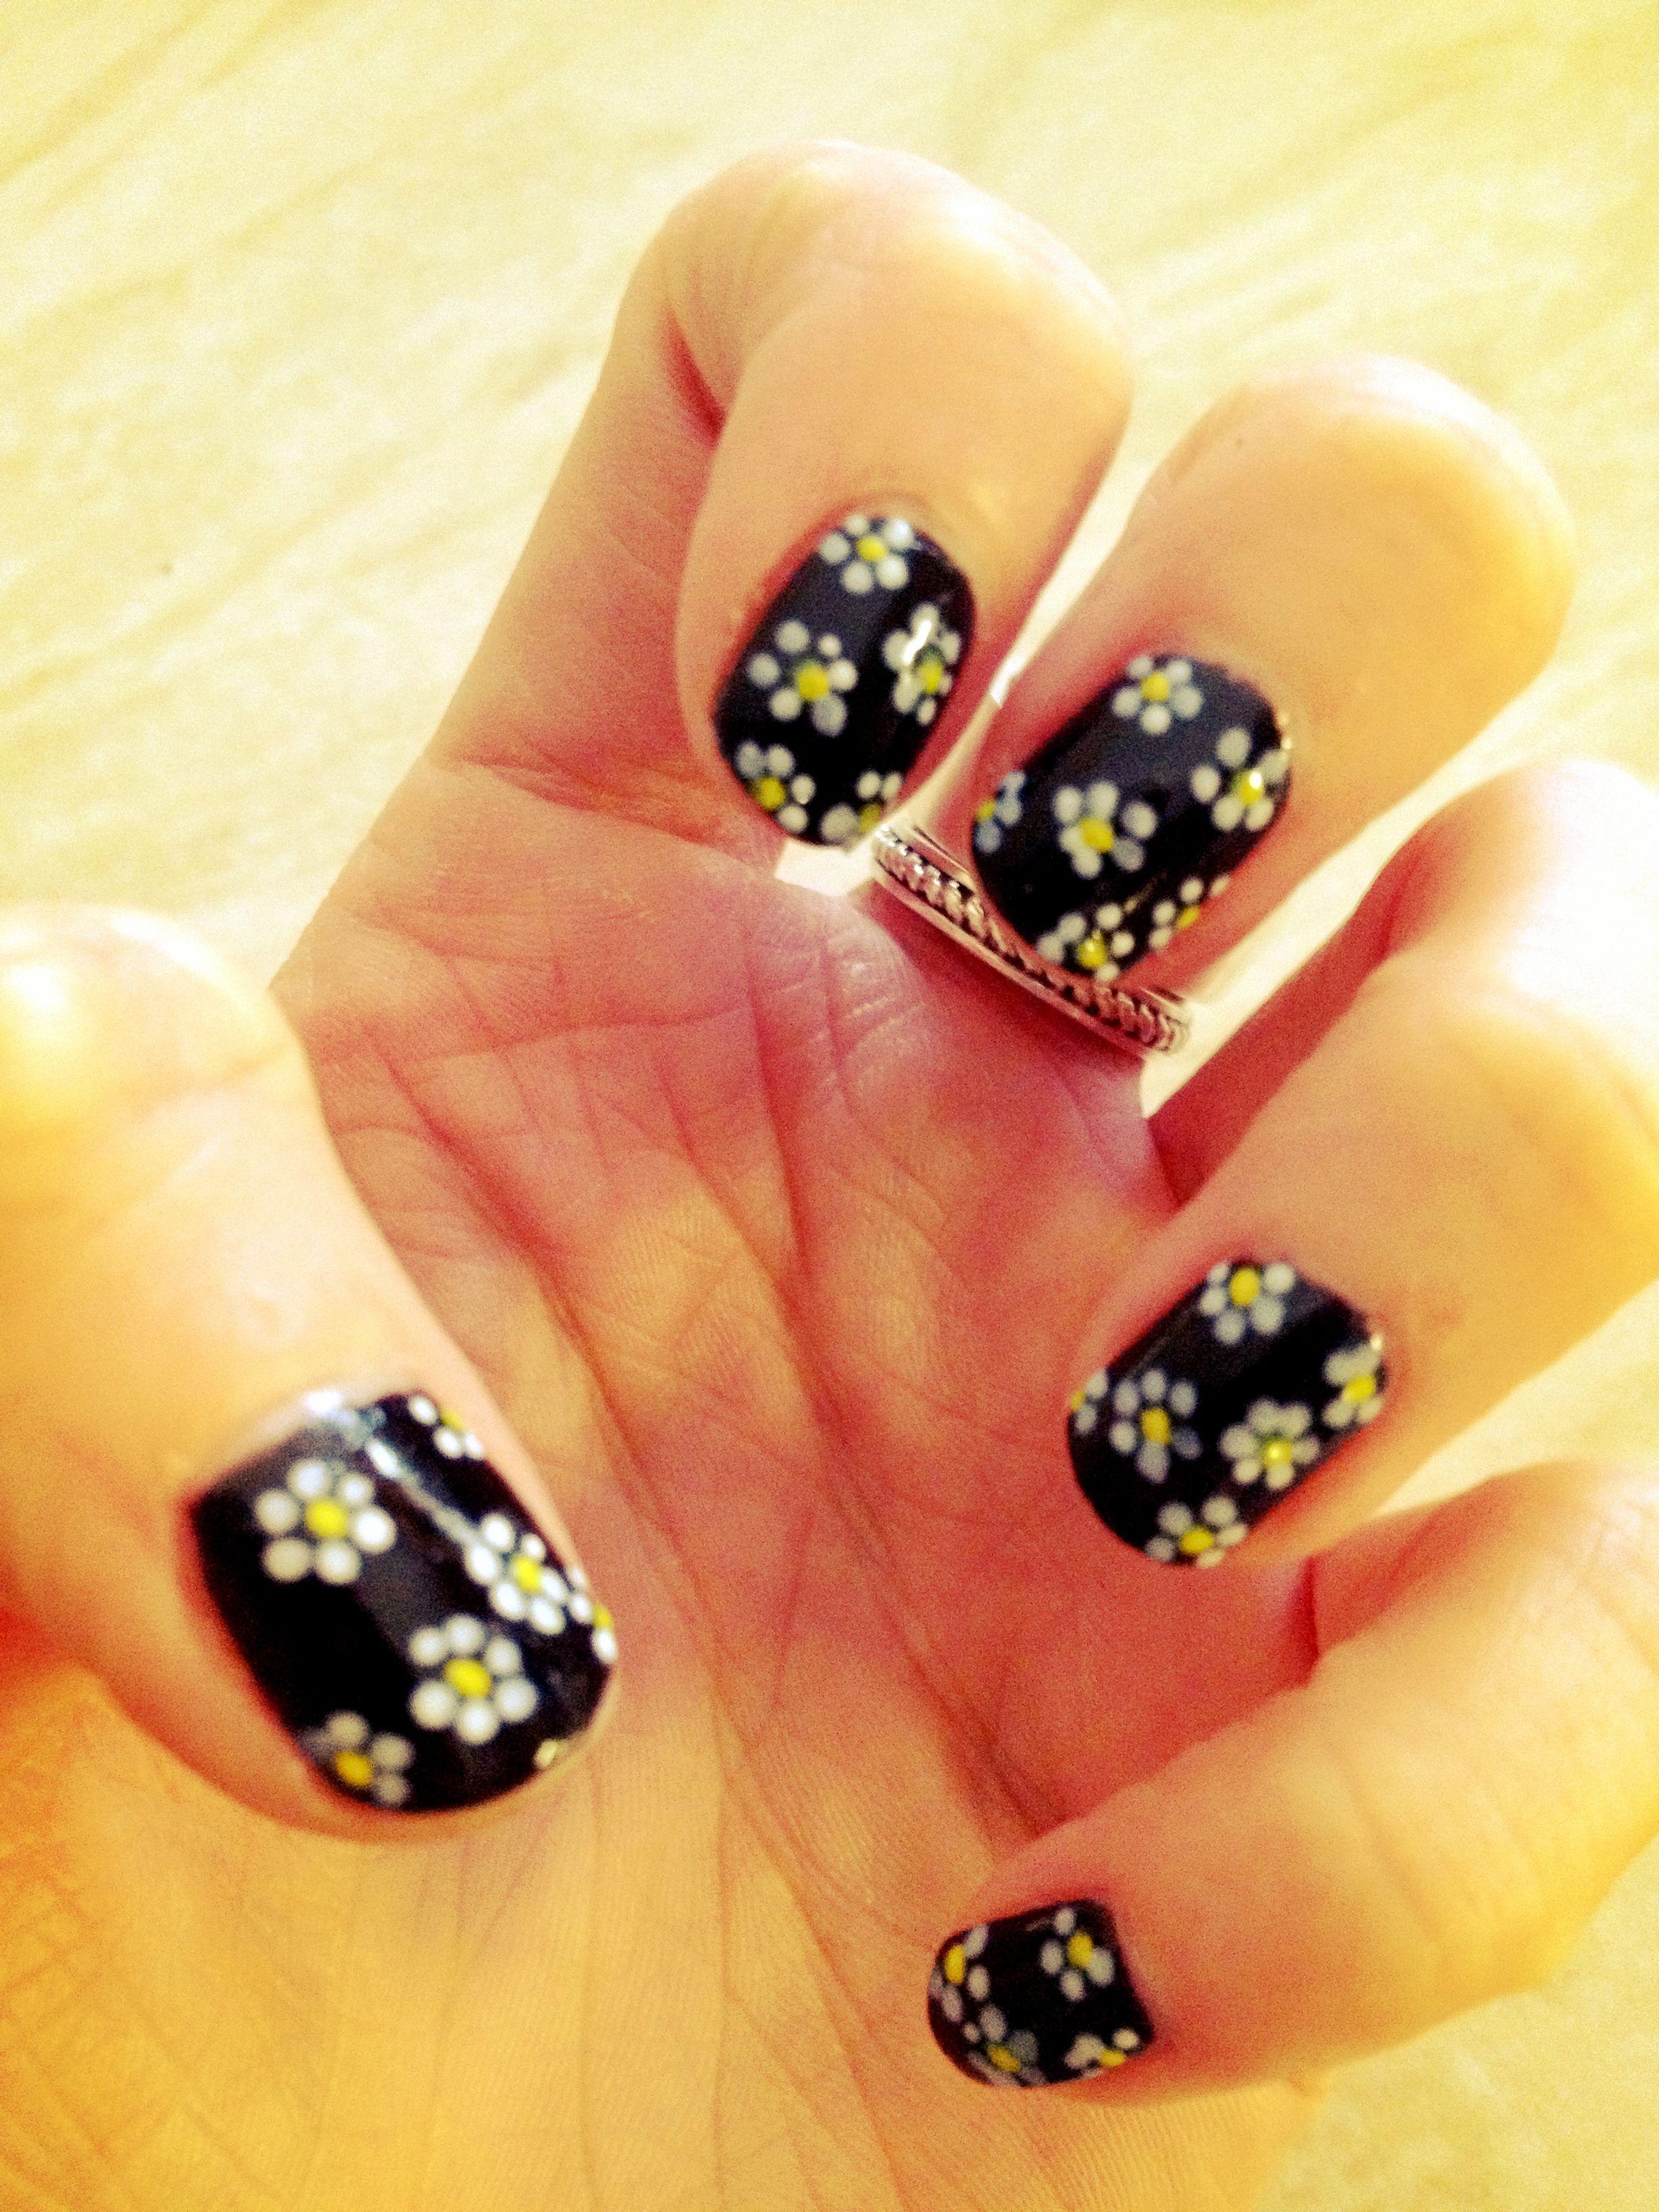 Daisy flowers nail art using white and yellow nail art pens | Nail ...